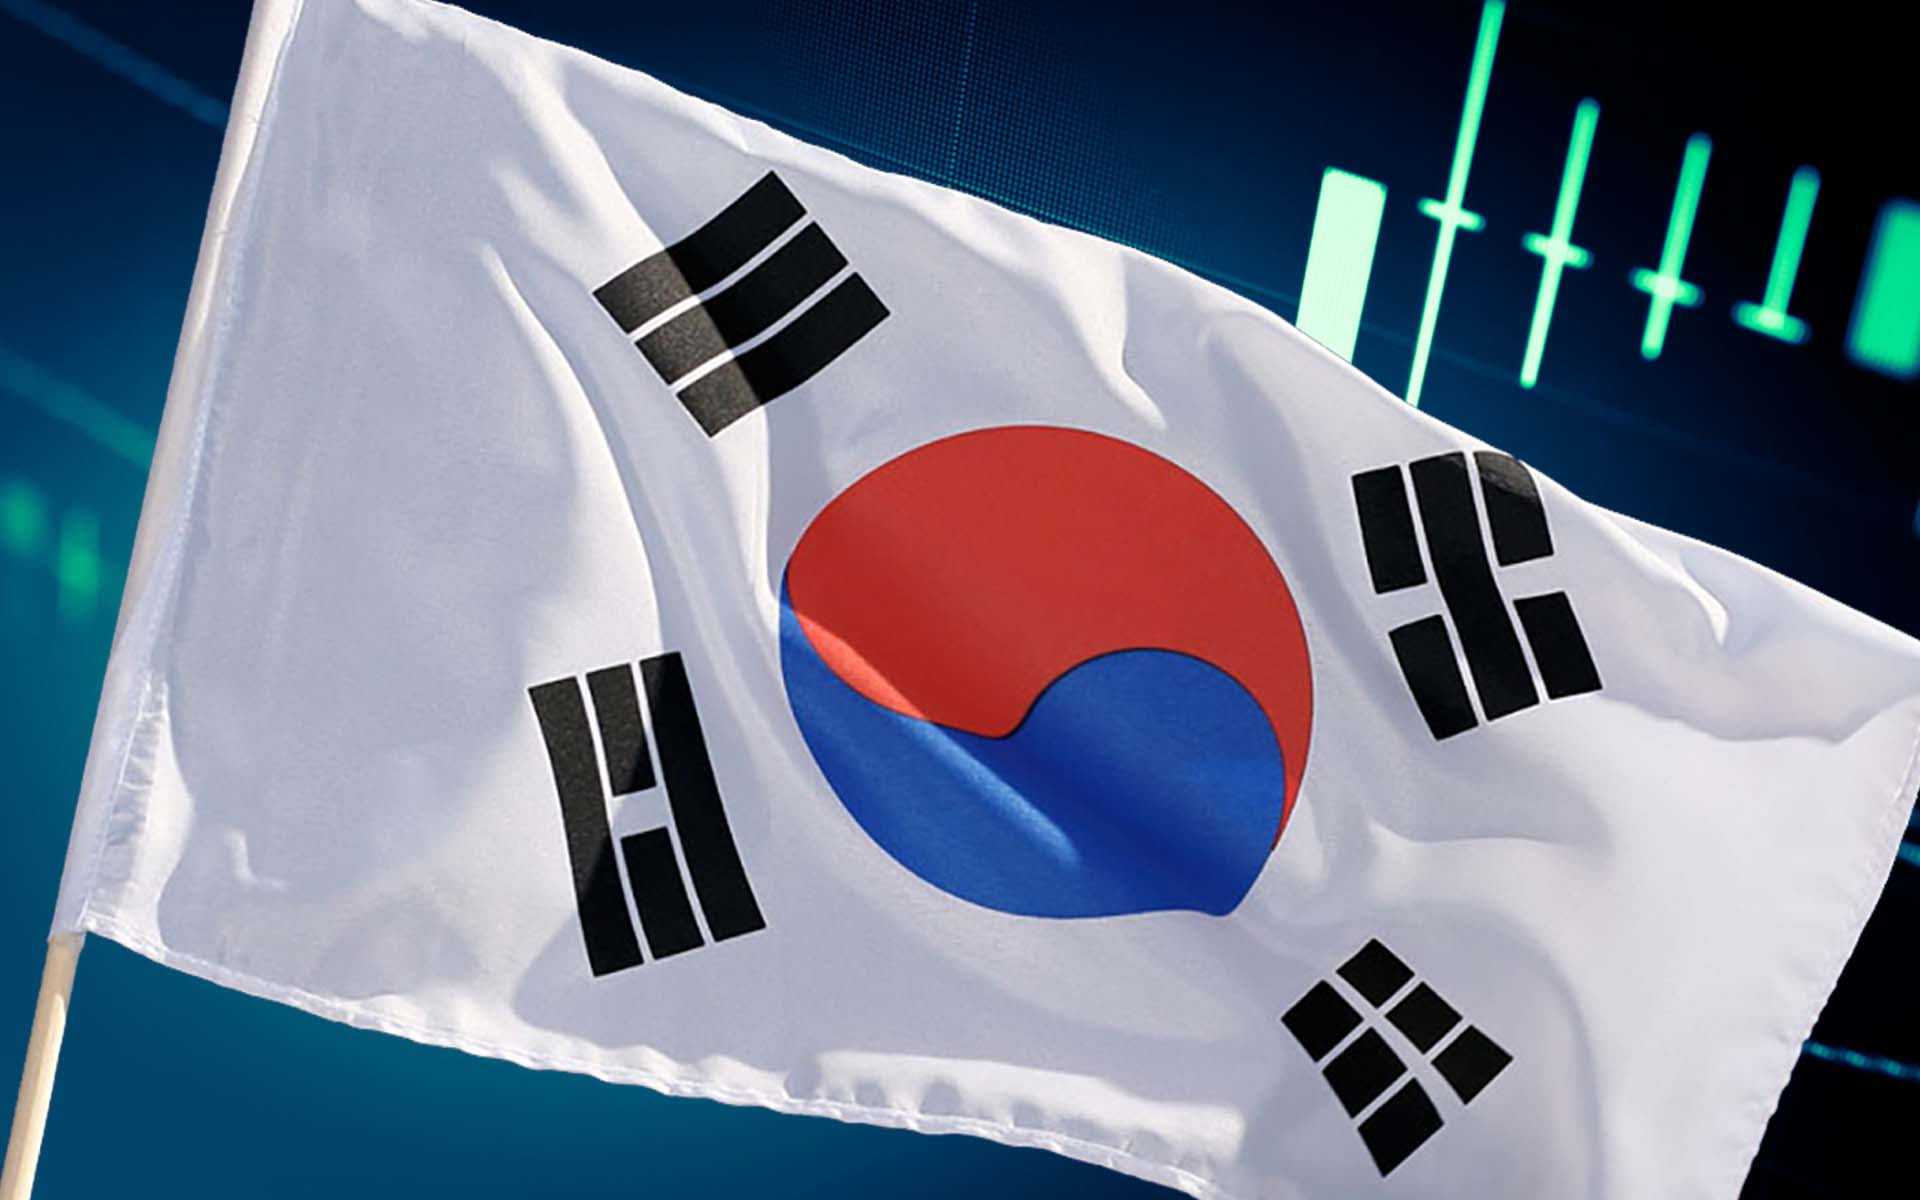 Crypto Custody Vital for Rapid Growth, Says Korea Institute of Finance Director